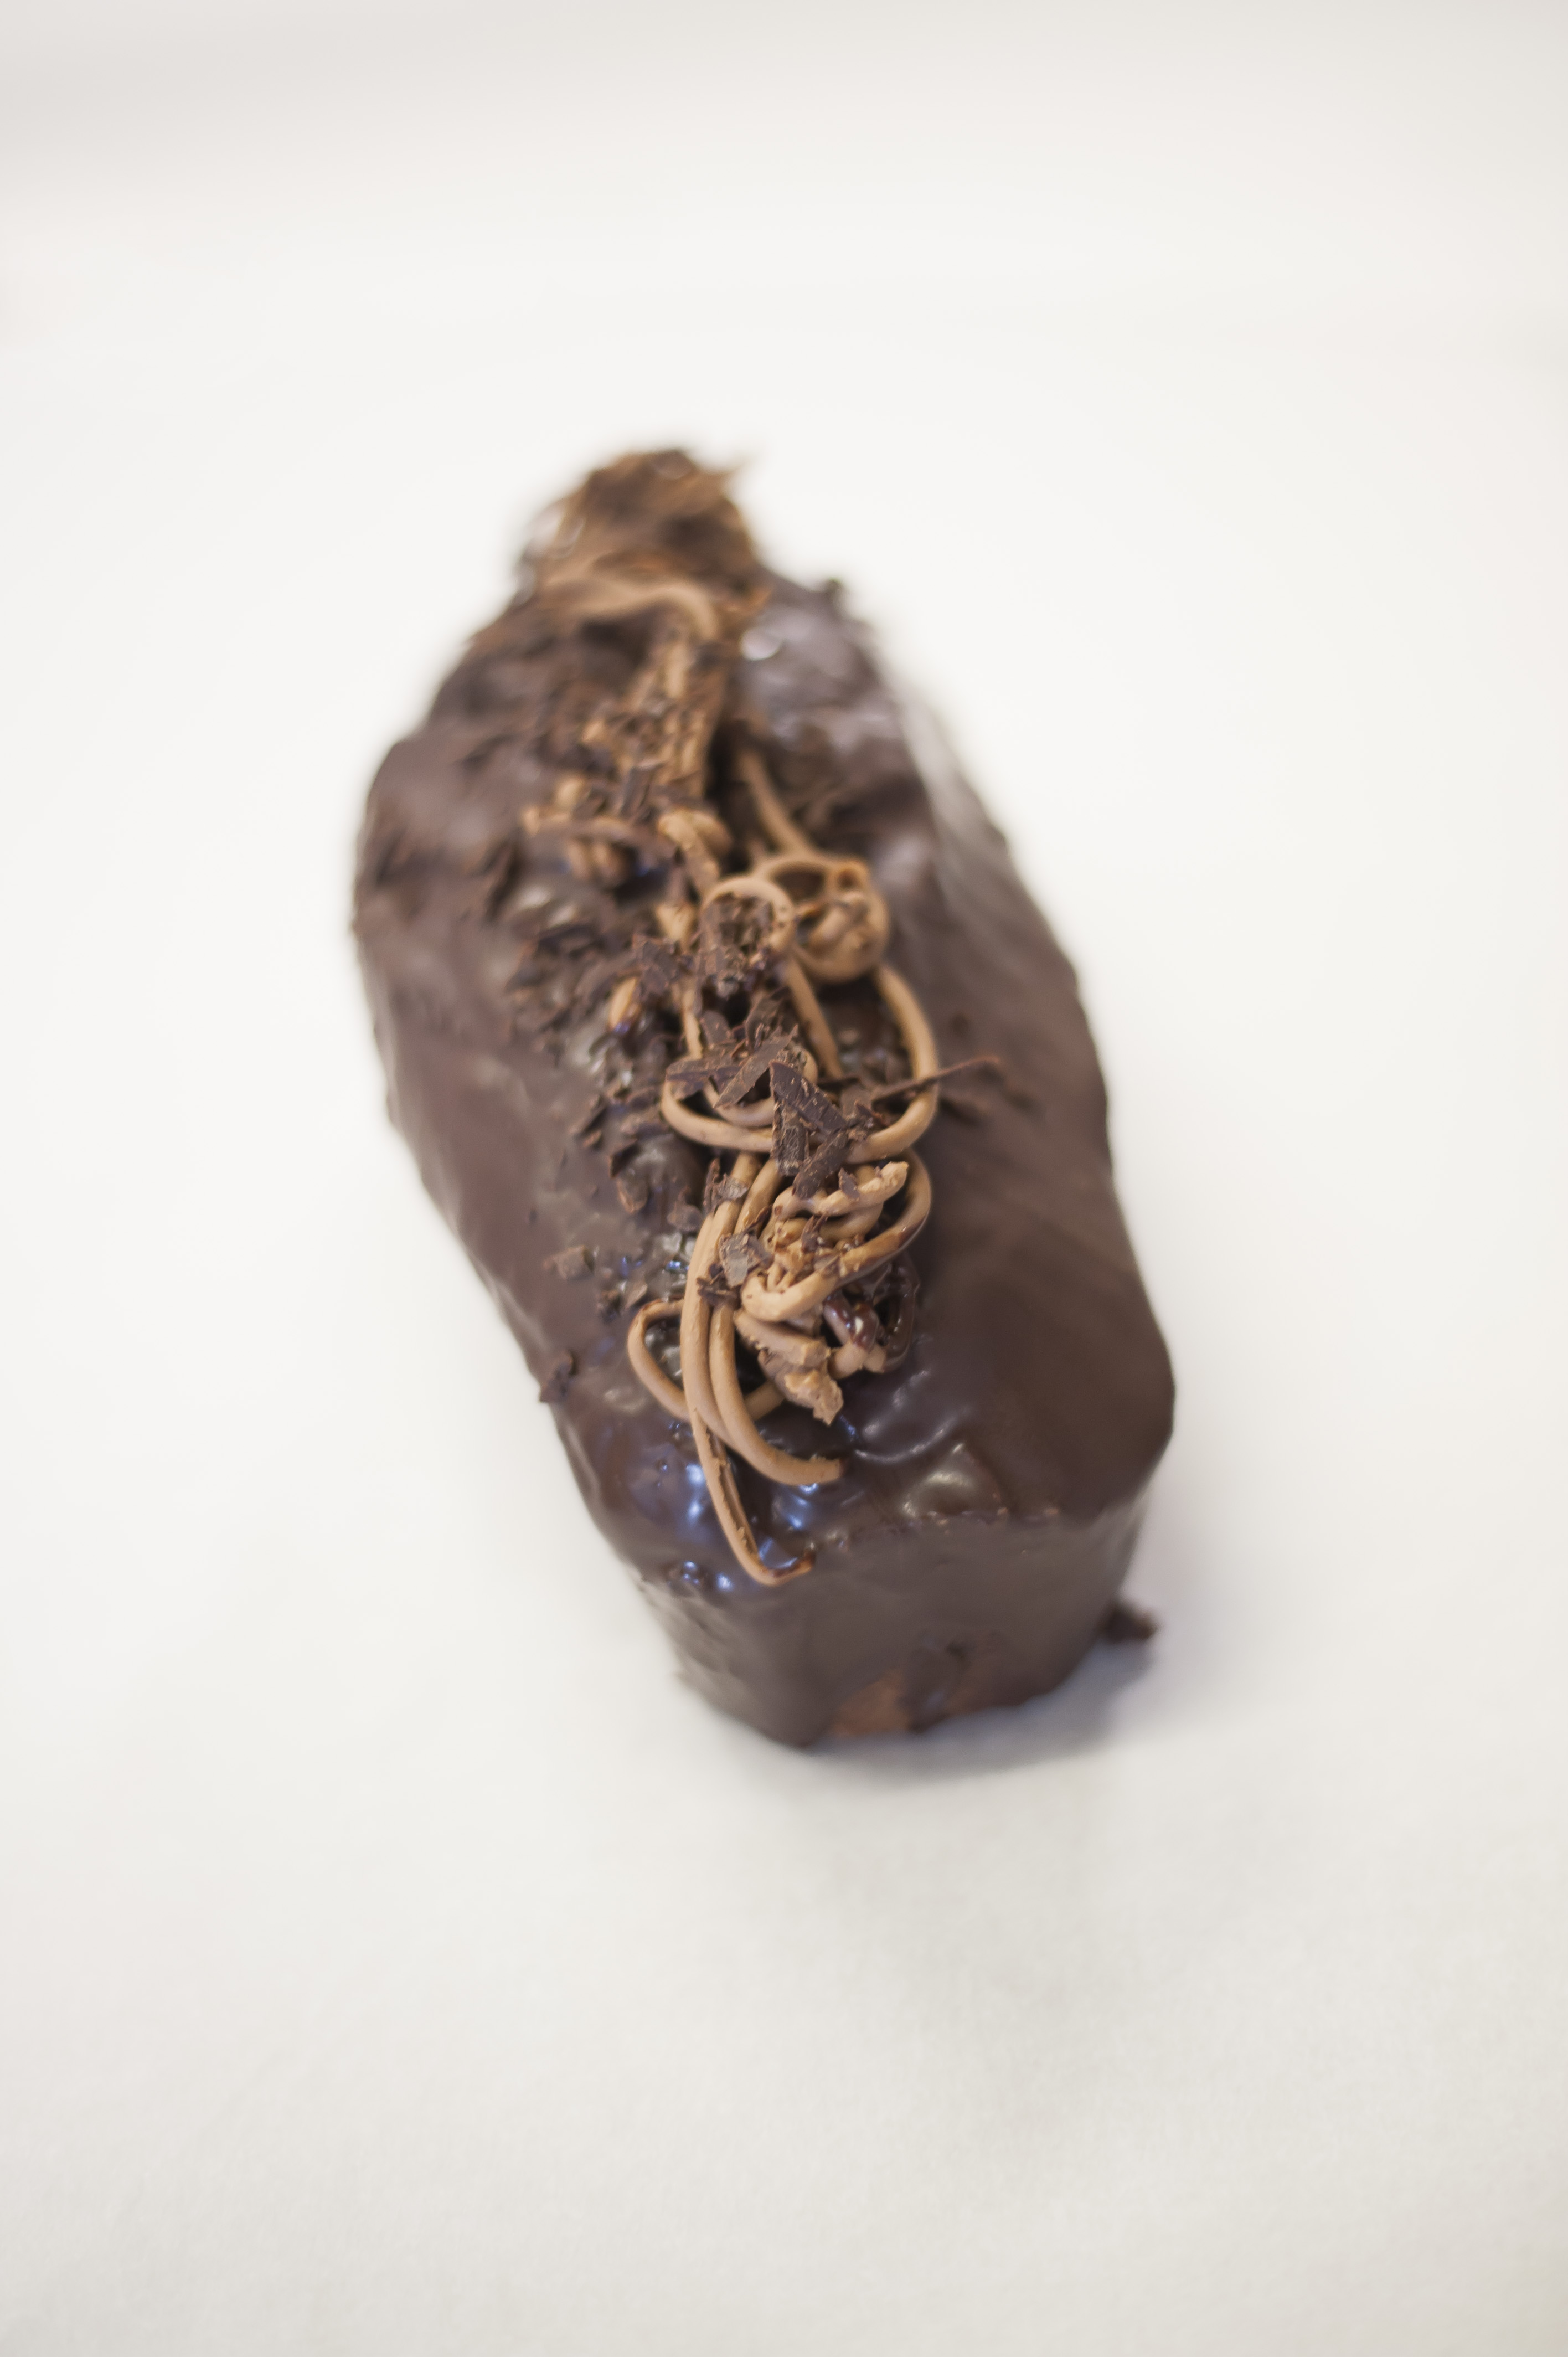 Chocolat Gianduja Pound Cake